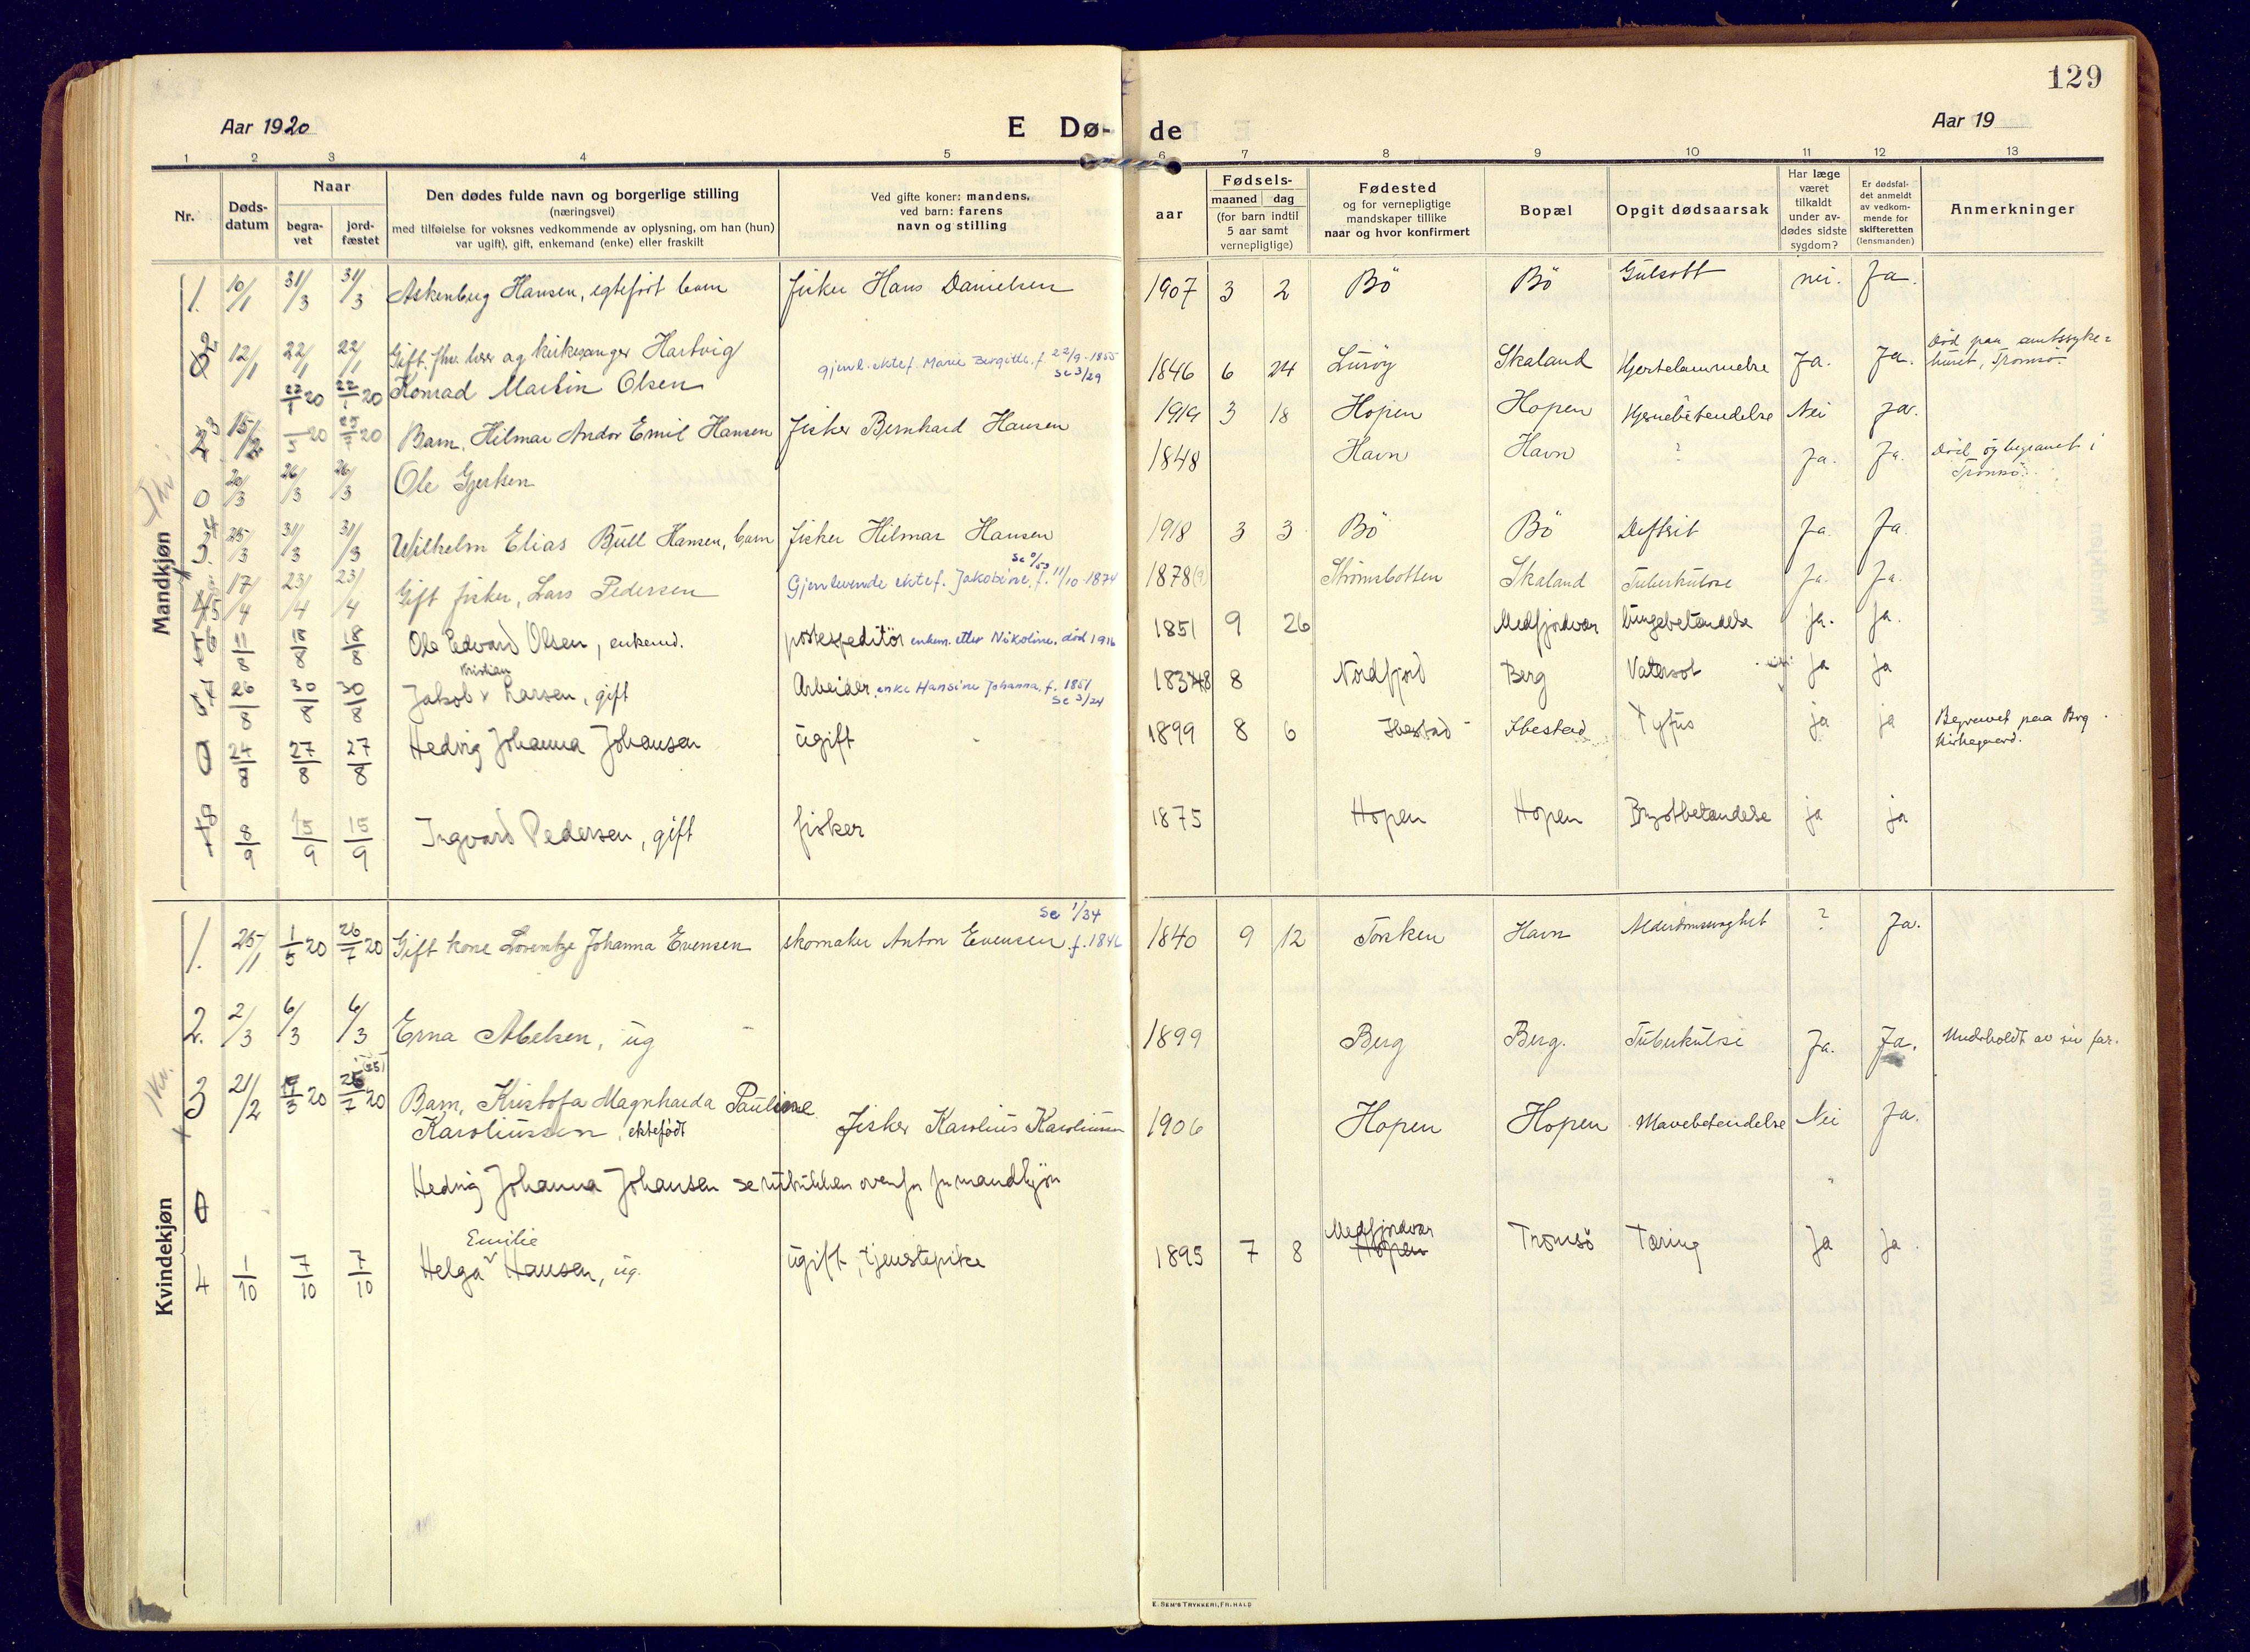 SATØ, Mefjord/Berg sokneprestkontor, G/Ga/Gaa: Ministerialbok nr. 9, 1916-1928, s. 129